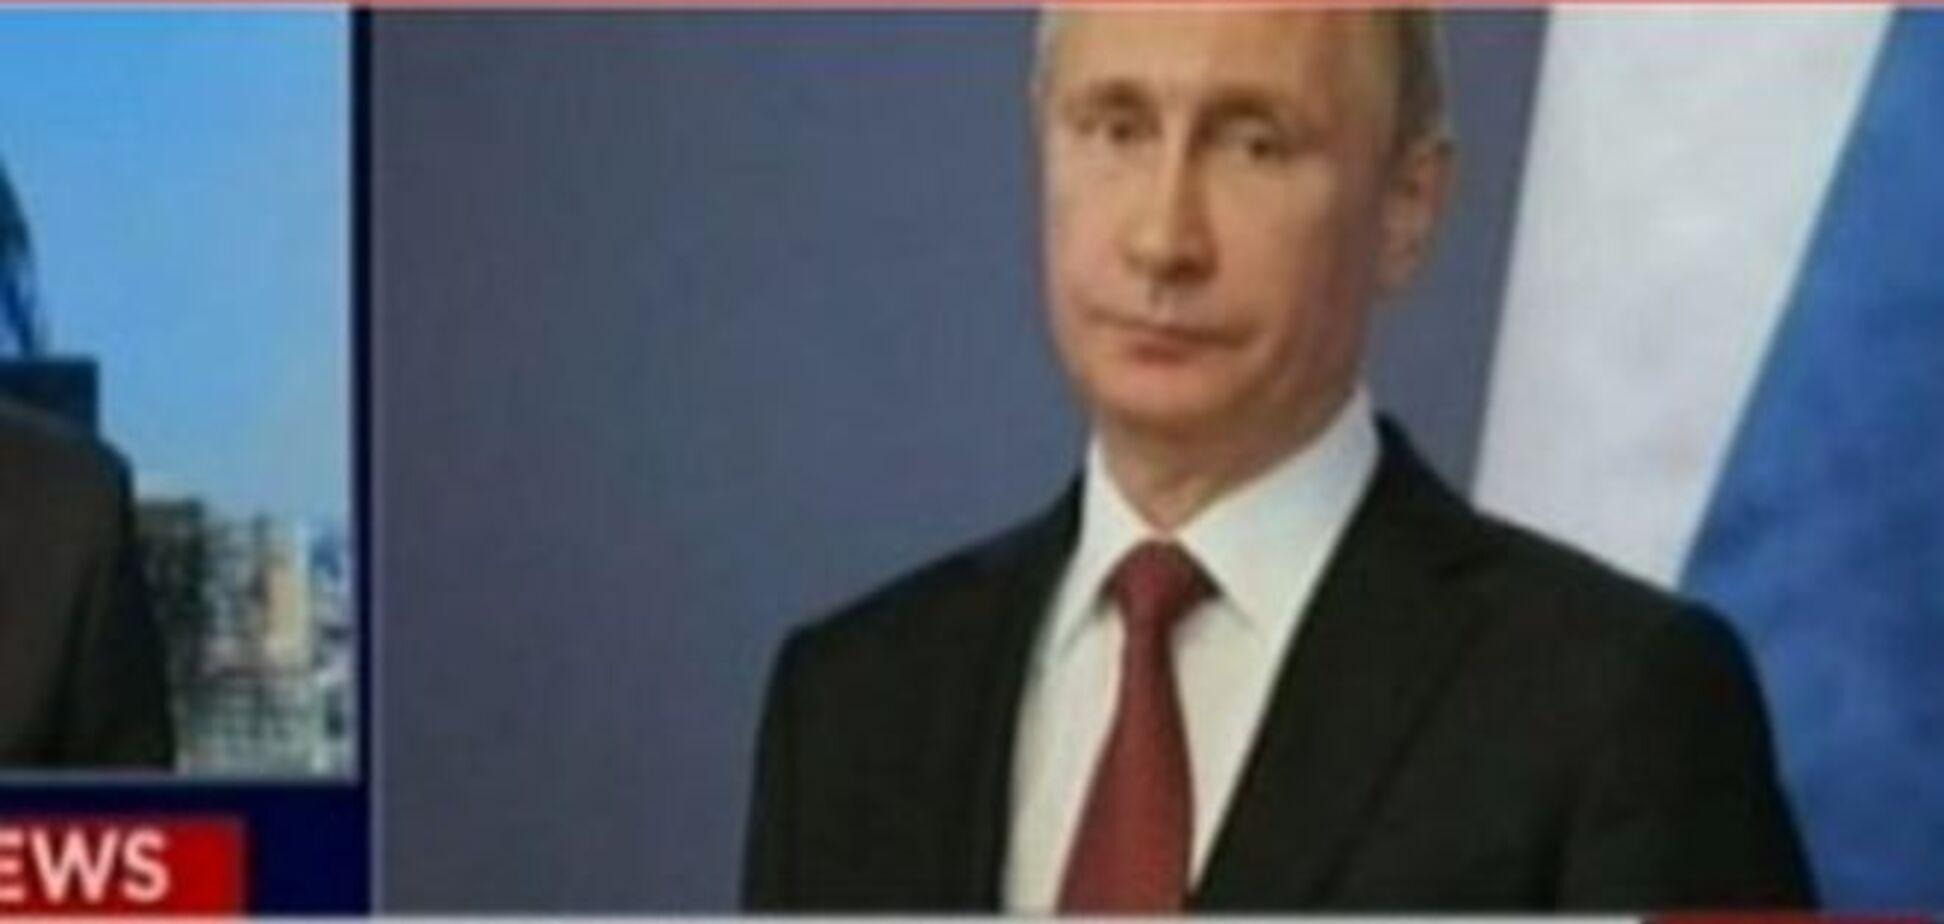 Канал СNN показал Путина террористом 'Исламского государства': видео конфуза